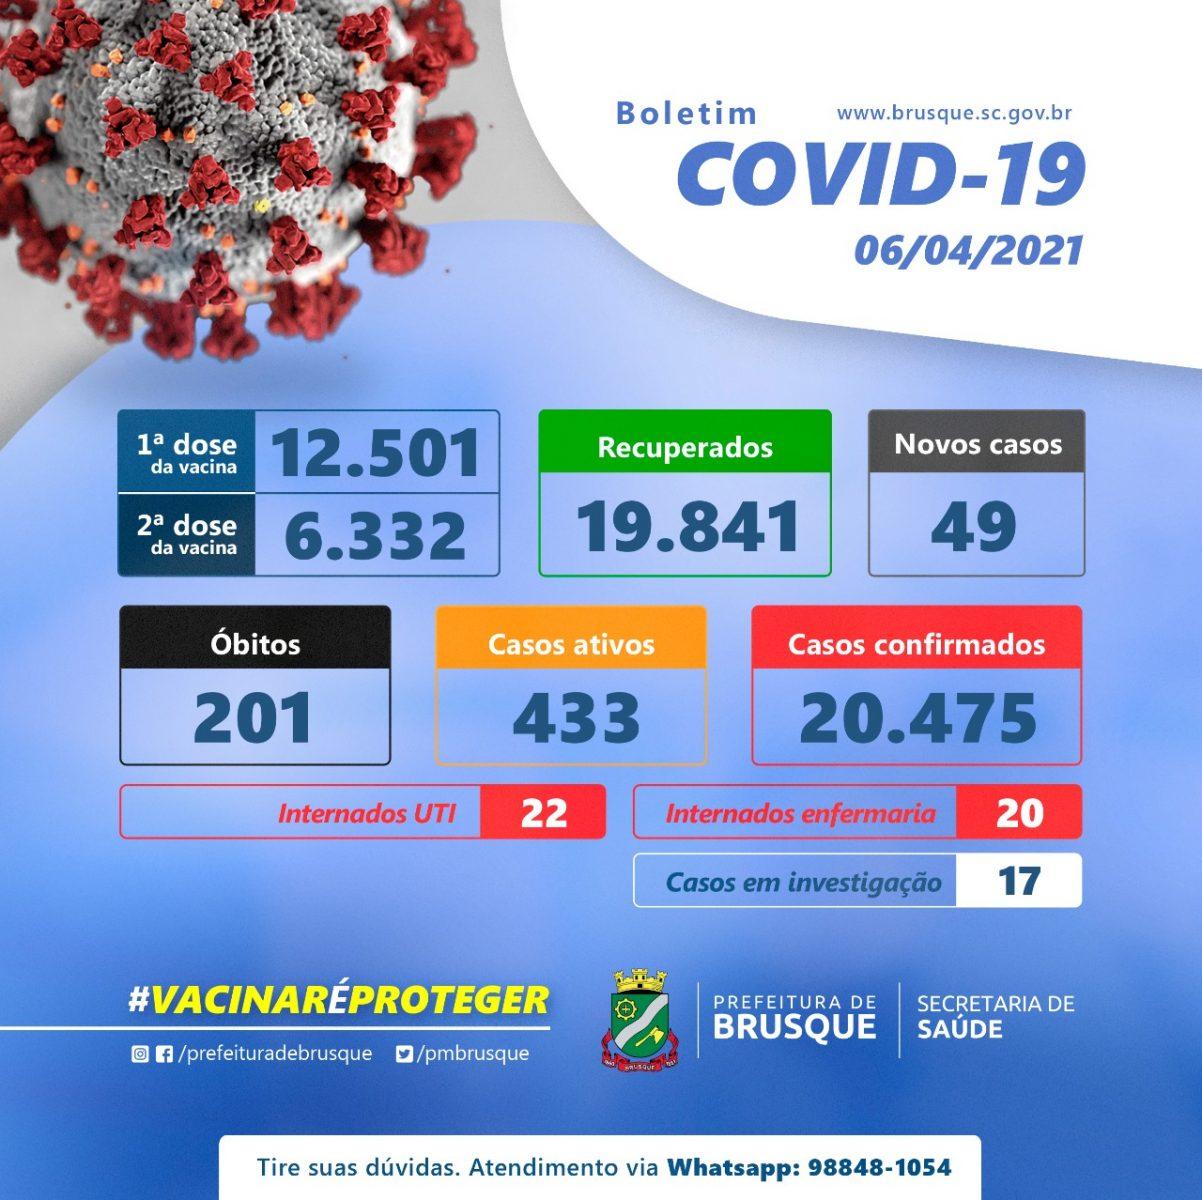 Covid 19: Confira o boletim epidemiológico desta terça-feira (06)